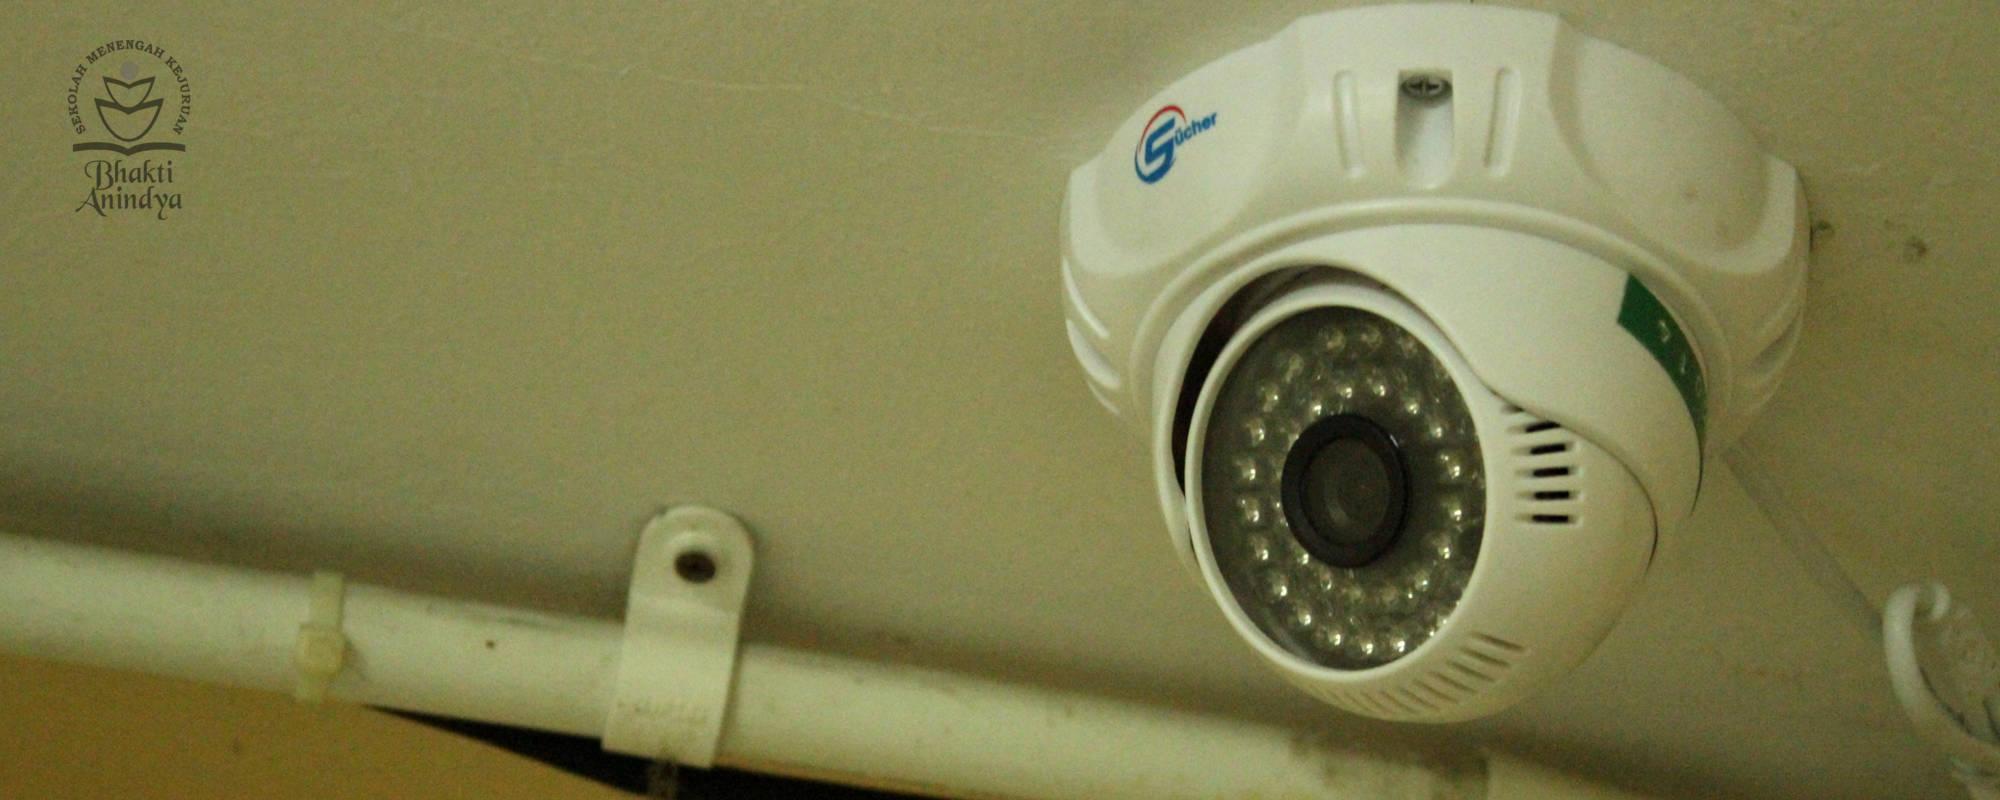 Ruang kelas SMK Bhakti Anindya Tangerang dilengkapi CCTV